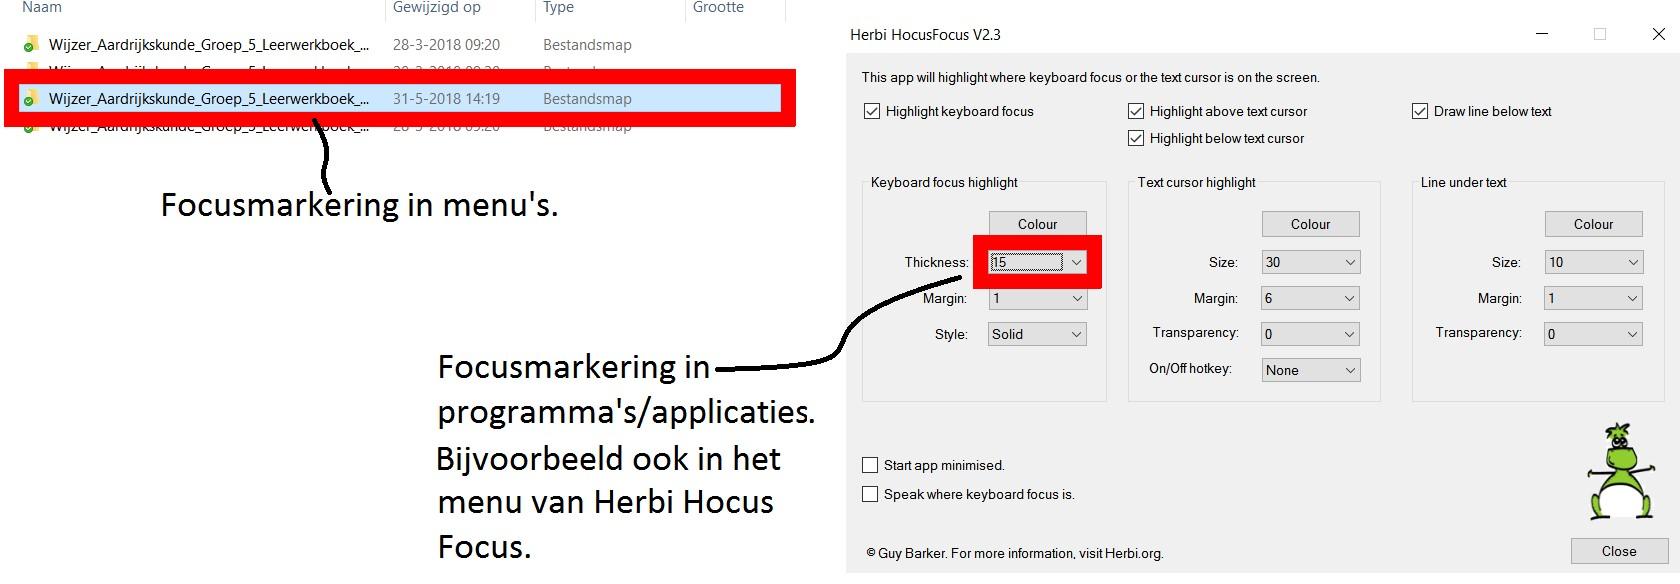 uitleg dialoogvenster Herbi HocusFocus